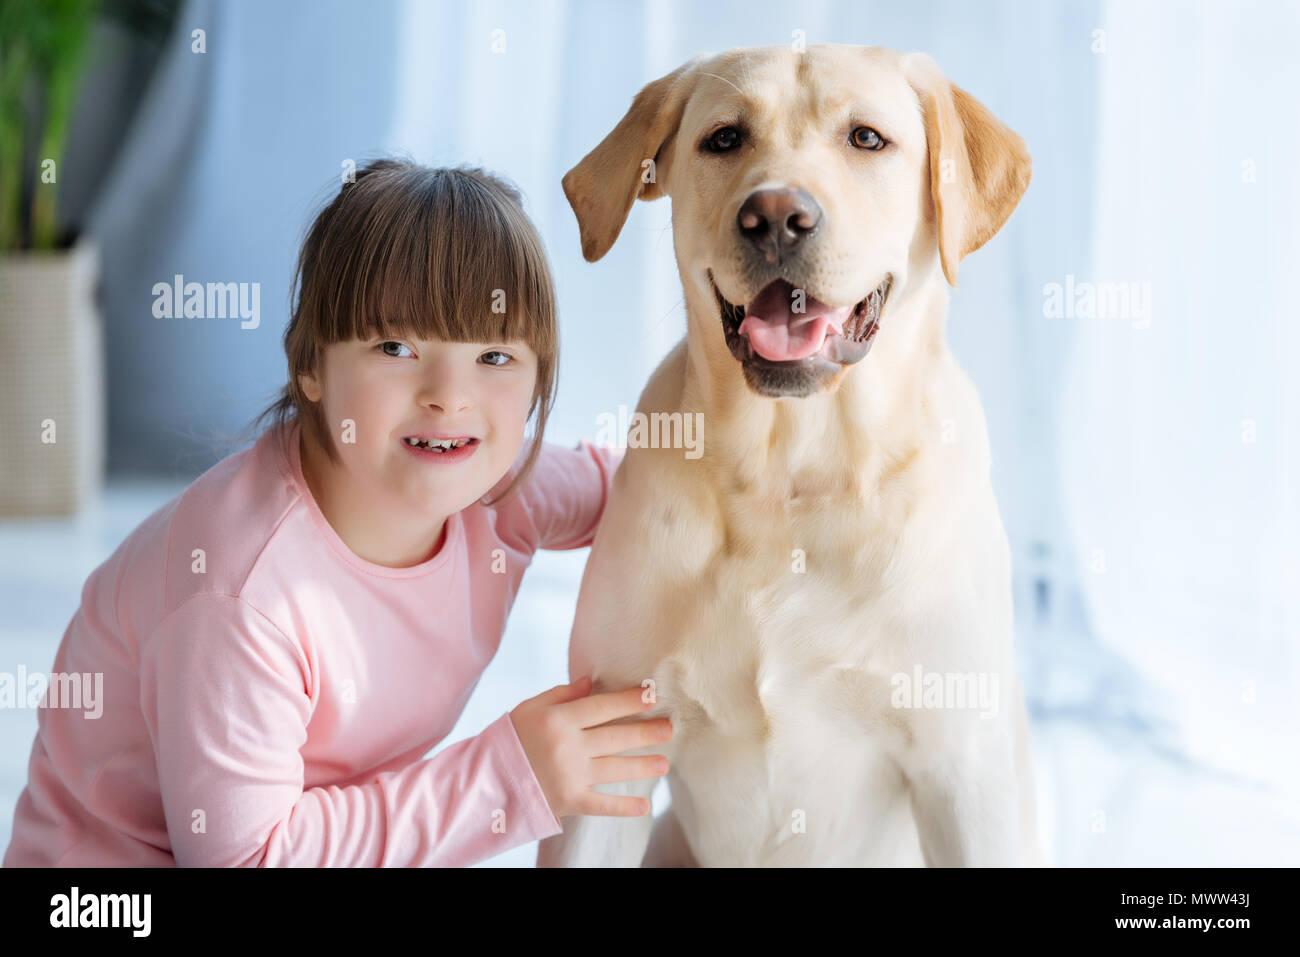 Happy child girl with down syndrome cherishing Labrador retriever - Stock Image